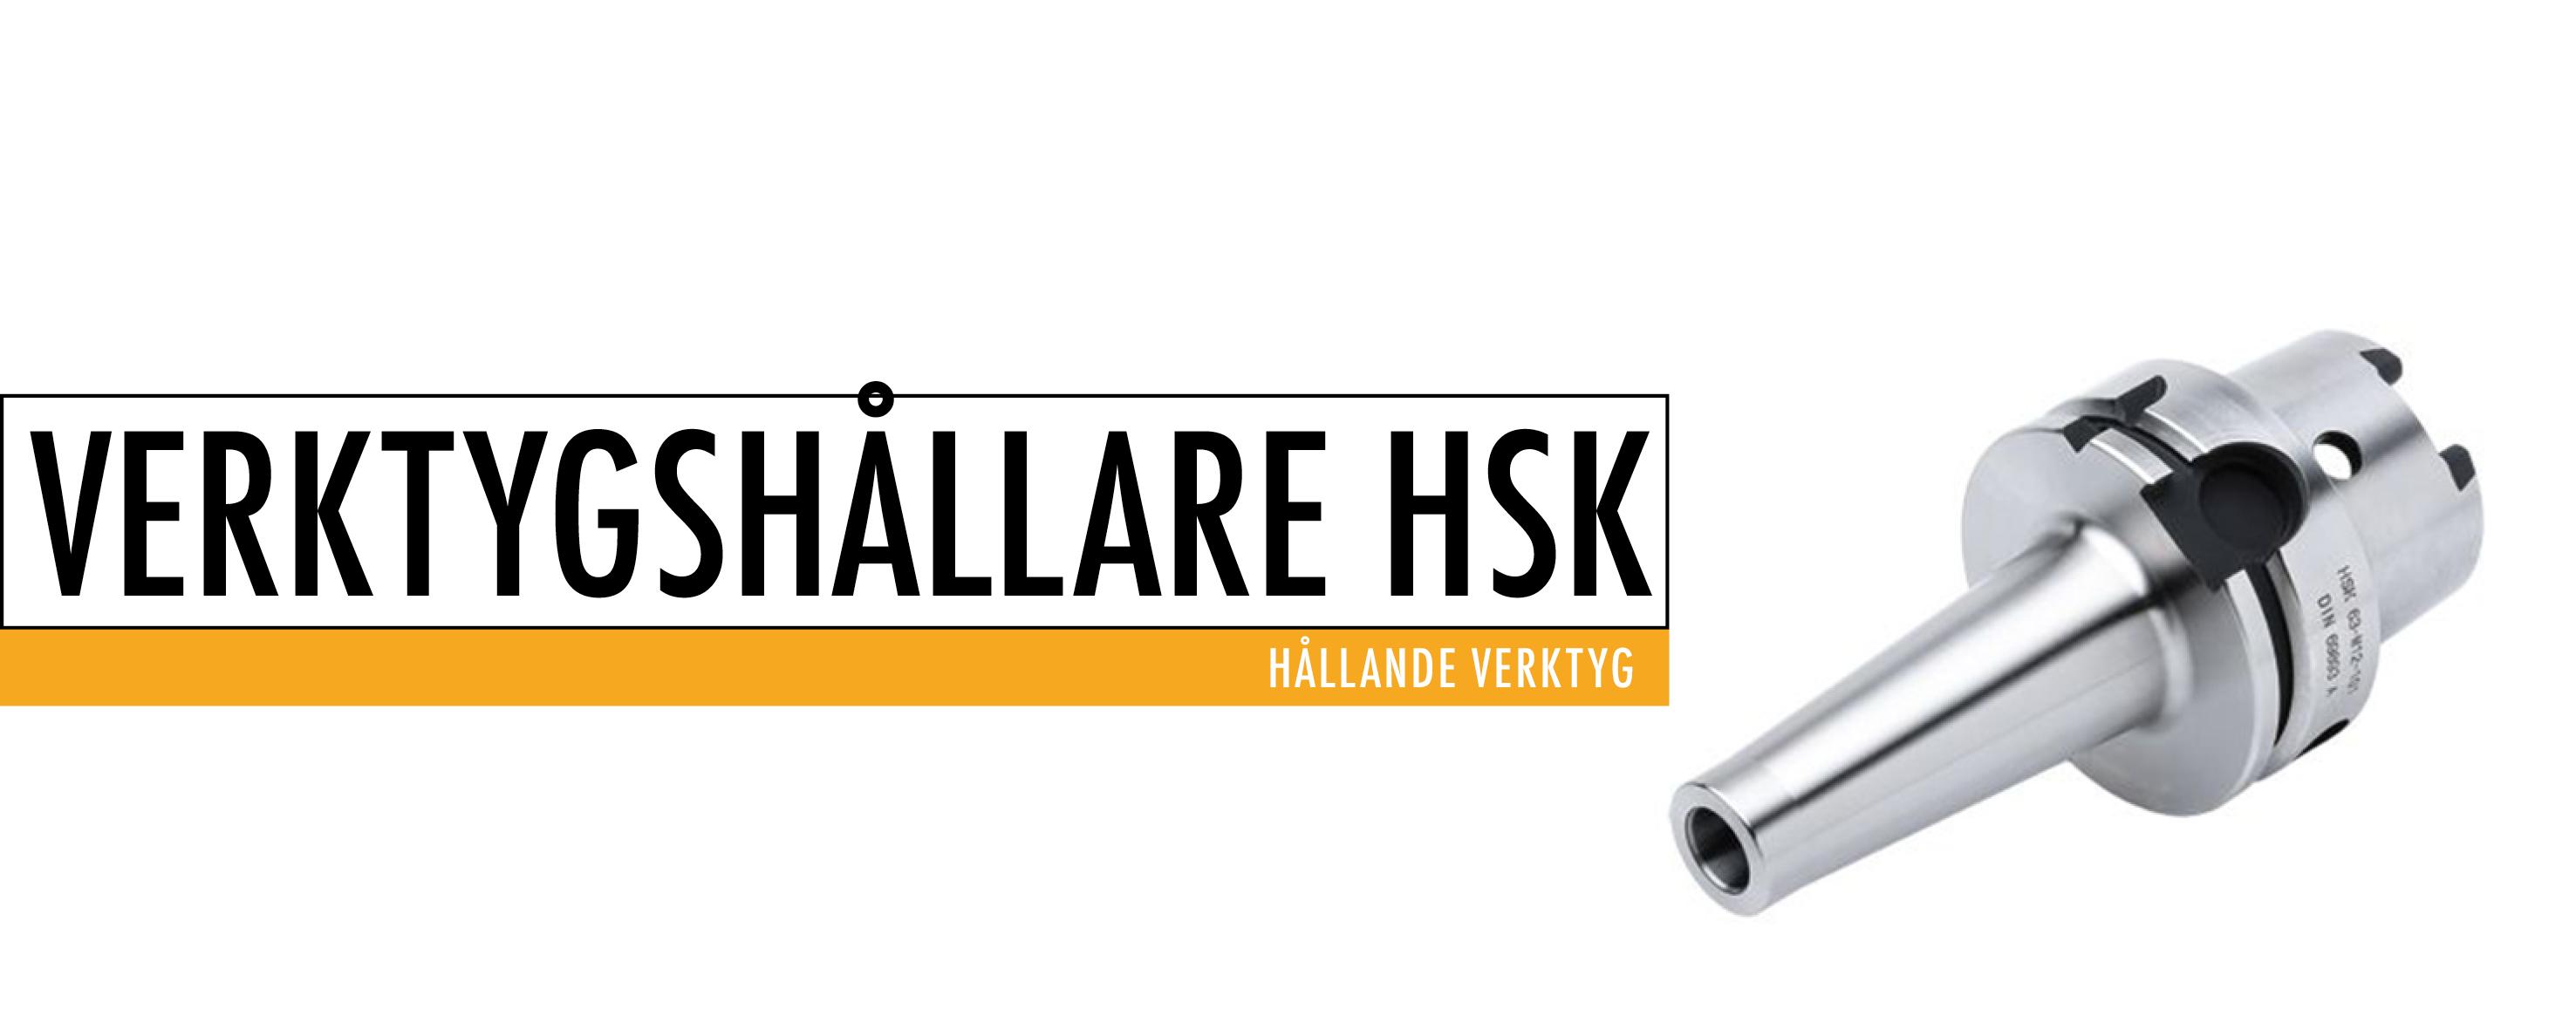 Verktygshållare HSK